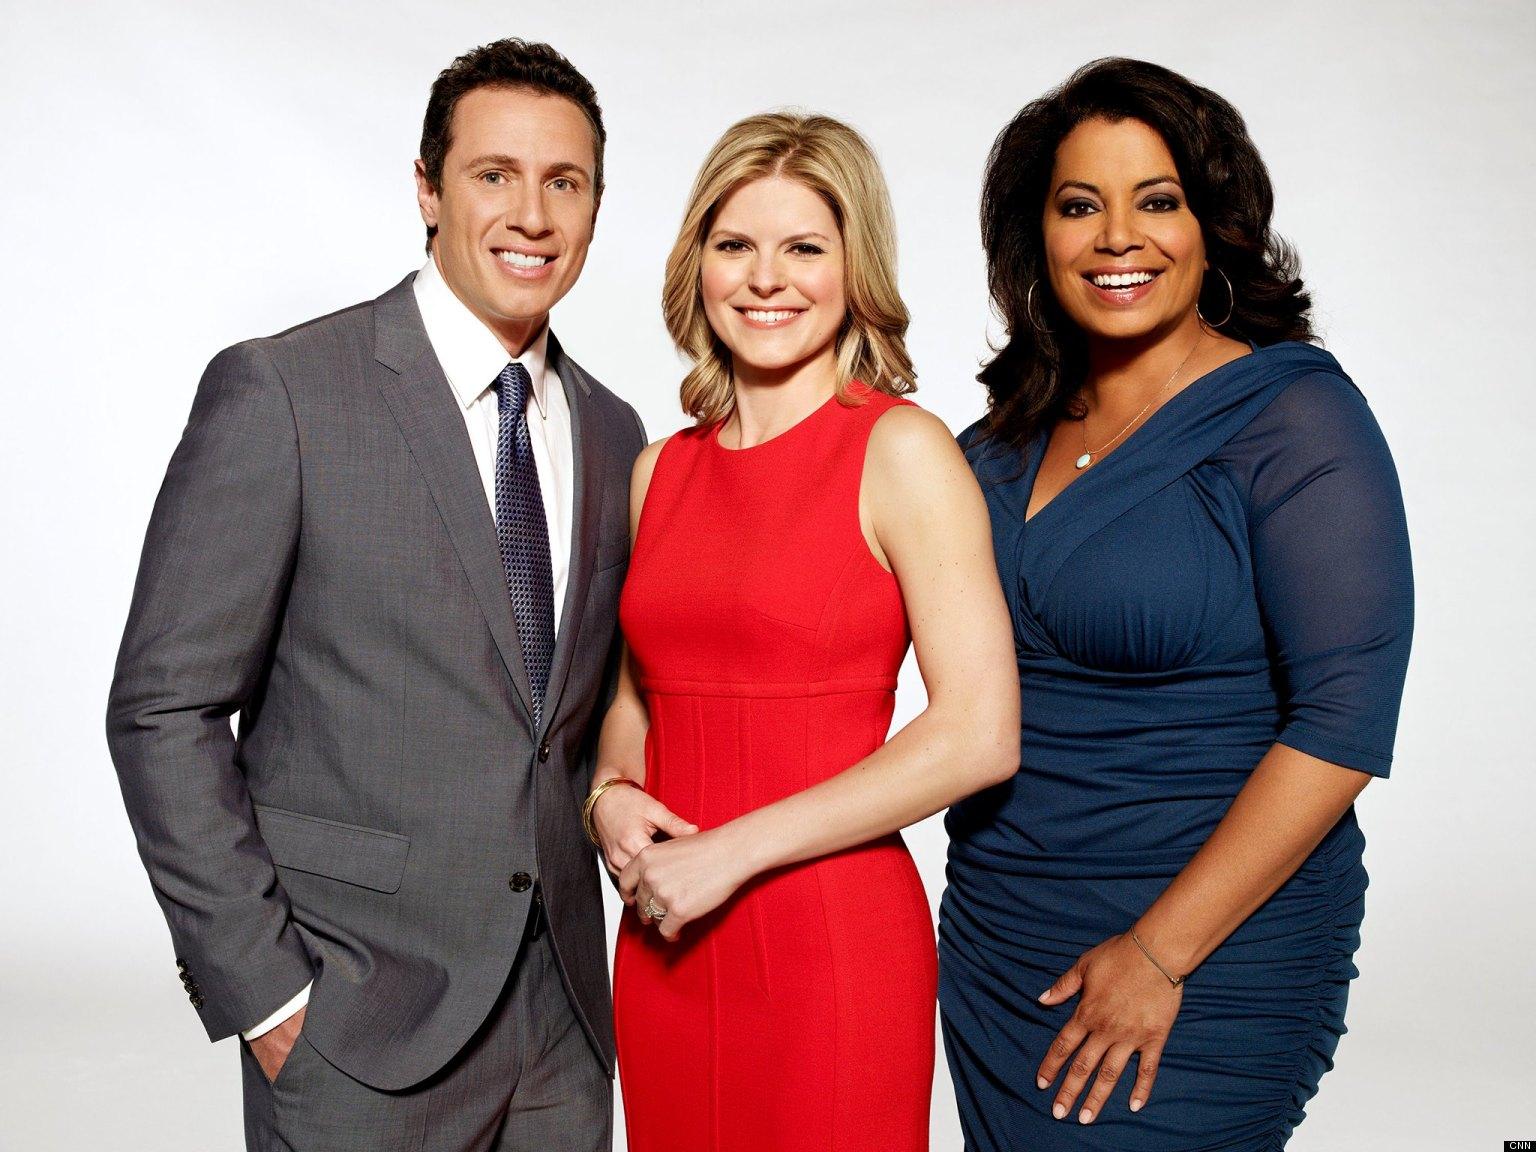 CNN Programs - Anchors/Reporters - John Berman |Cnn Morning News Anchors